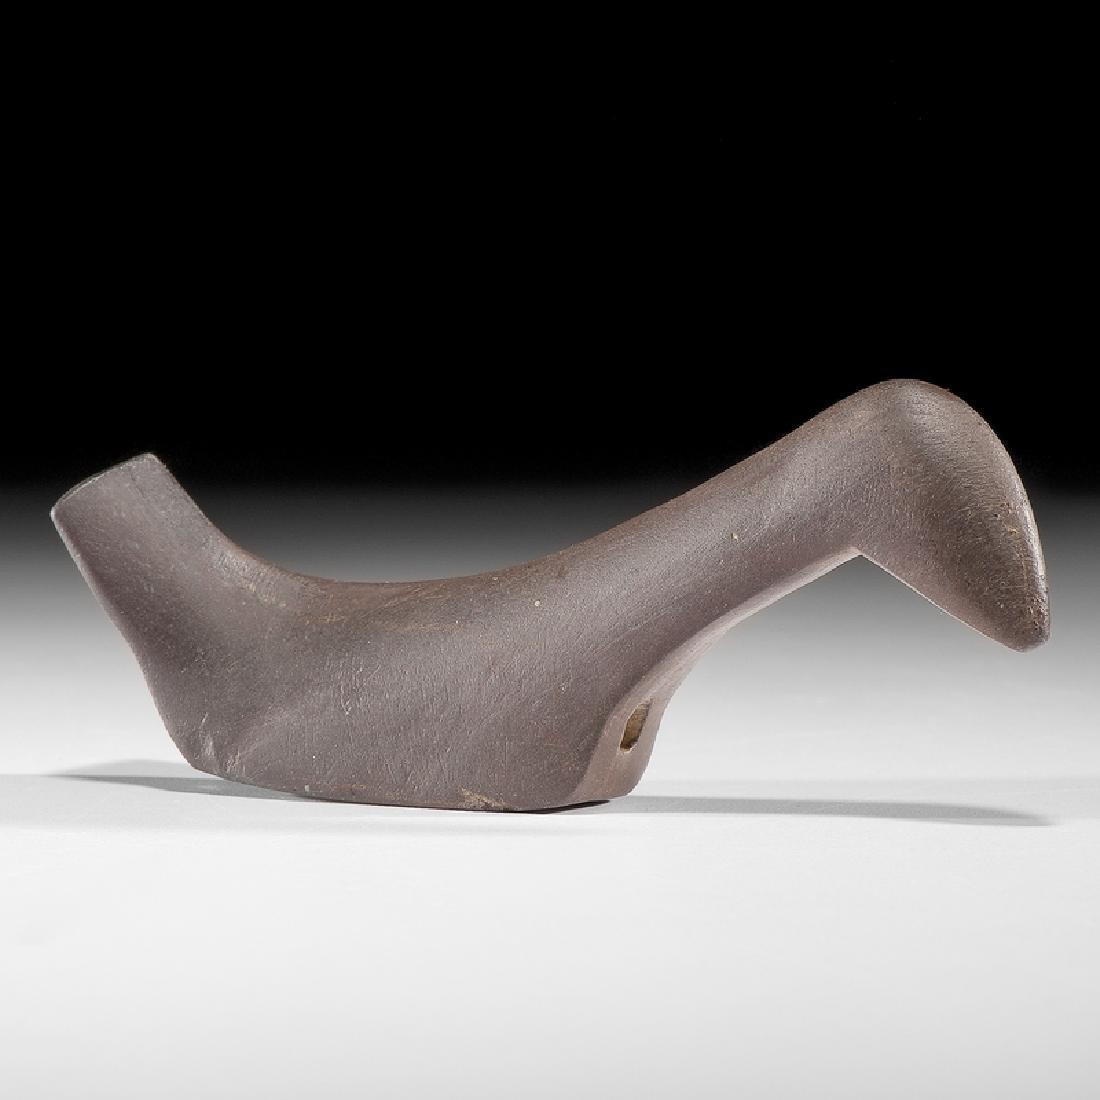 A Ferruginous Slate, Elongated Long Neck Birdstone,